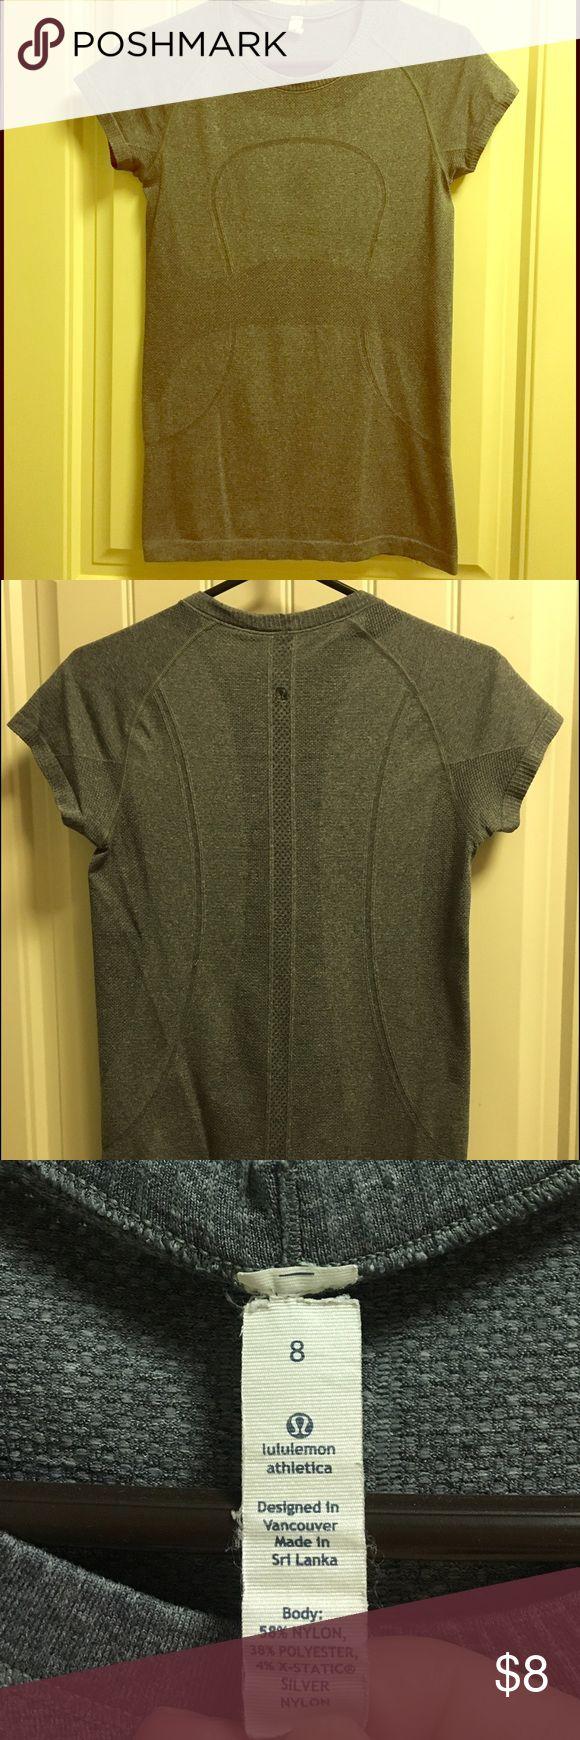 Lululemon Athletica Gray T-shirt Size 8 Lululemon Athletica Gray T-shirt Size 8 lululemon athletica Tops Tees - Short Sleeve